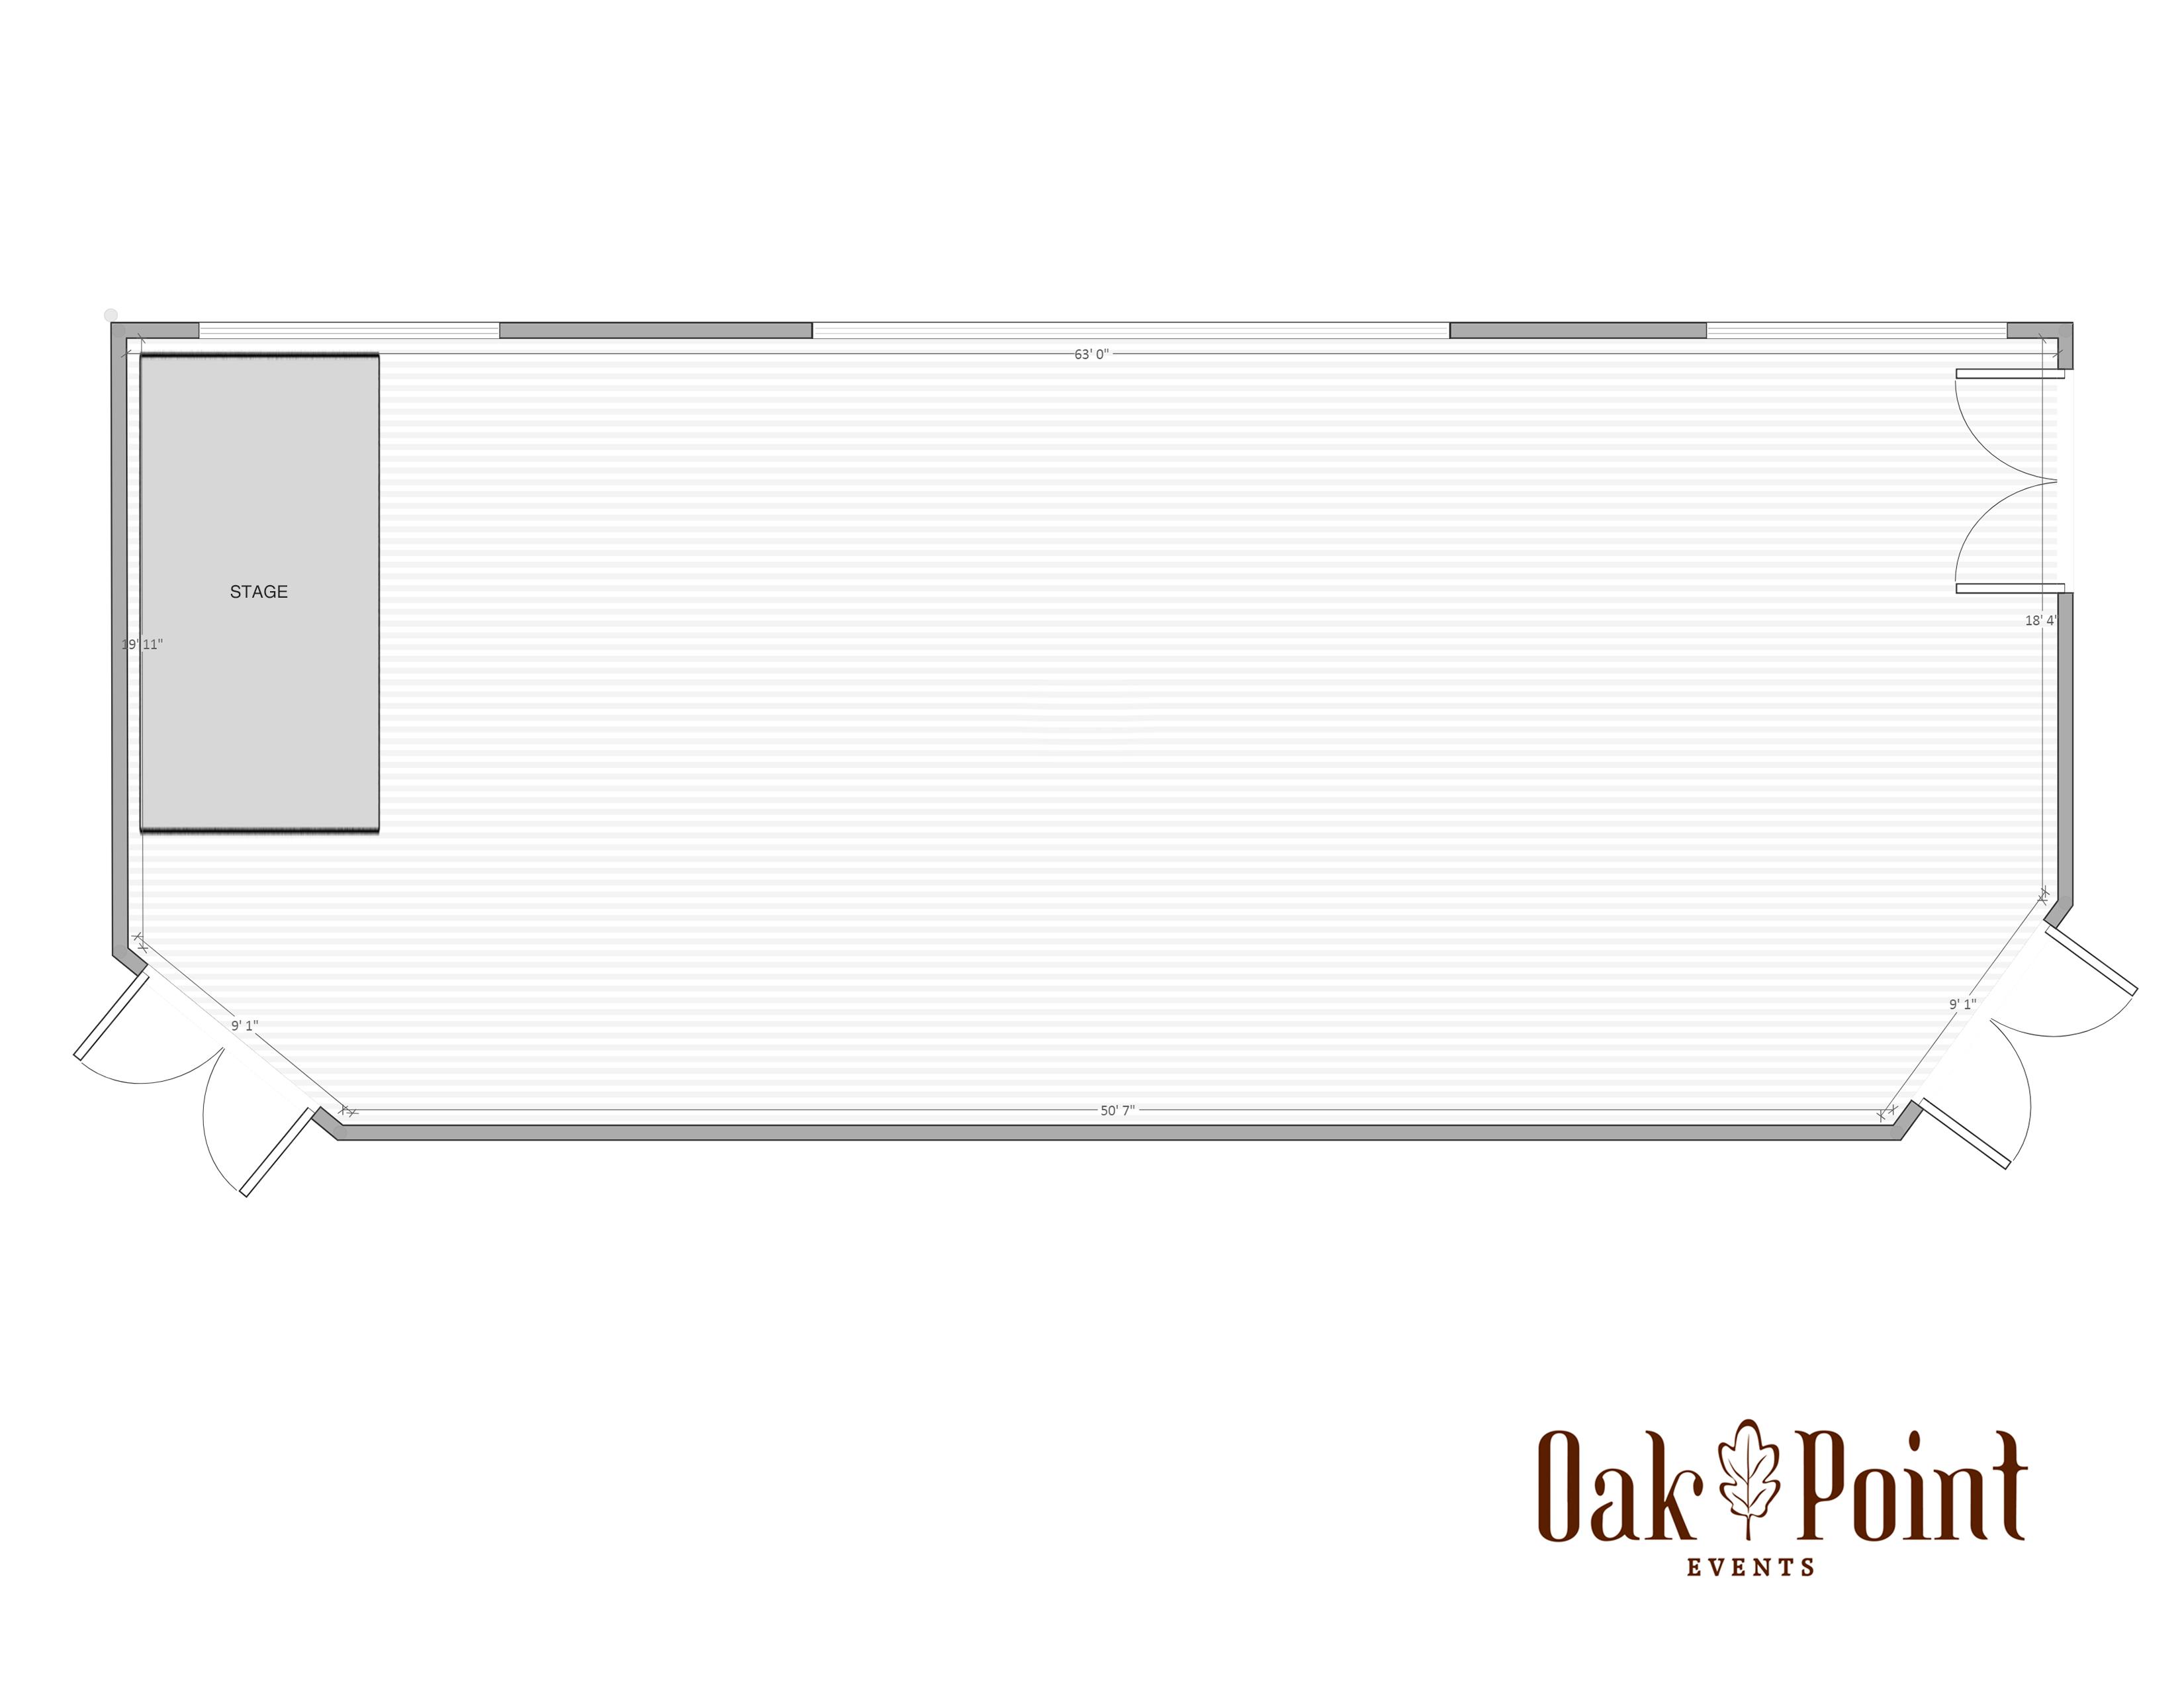 Oak Point Events Floorplan